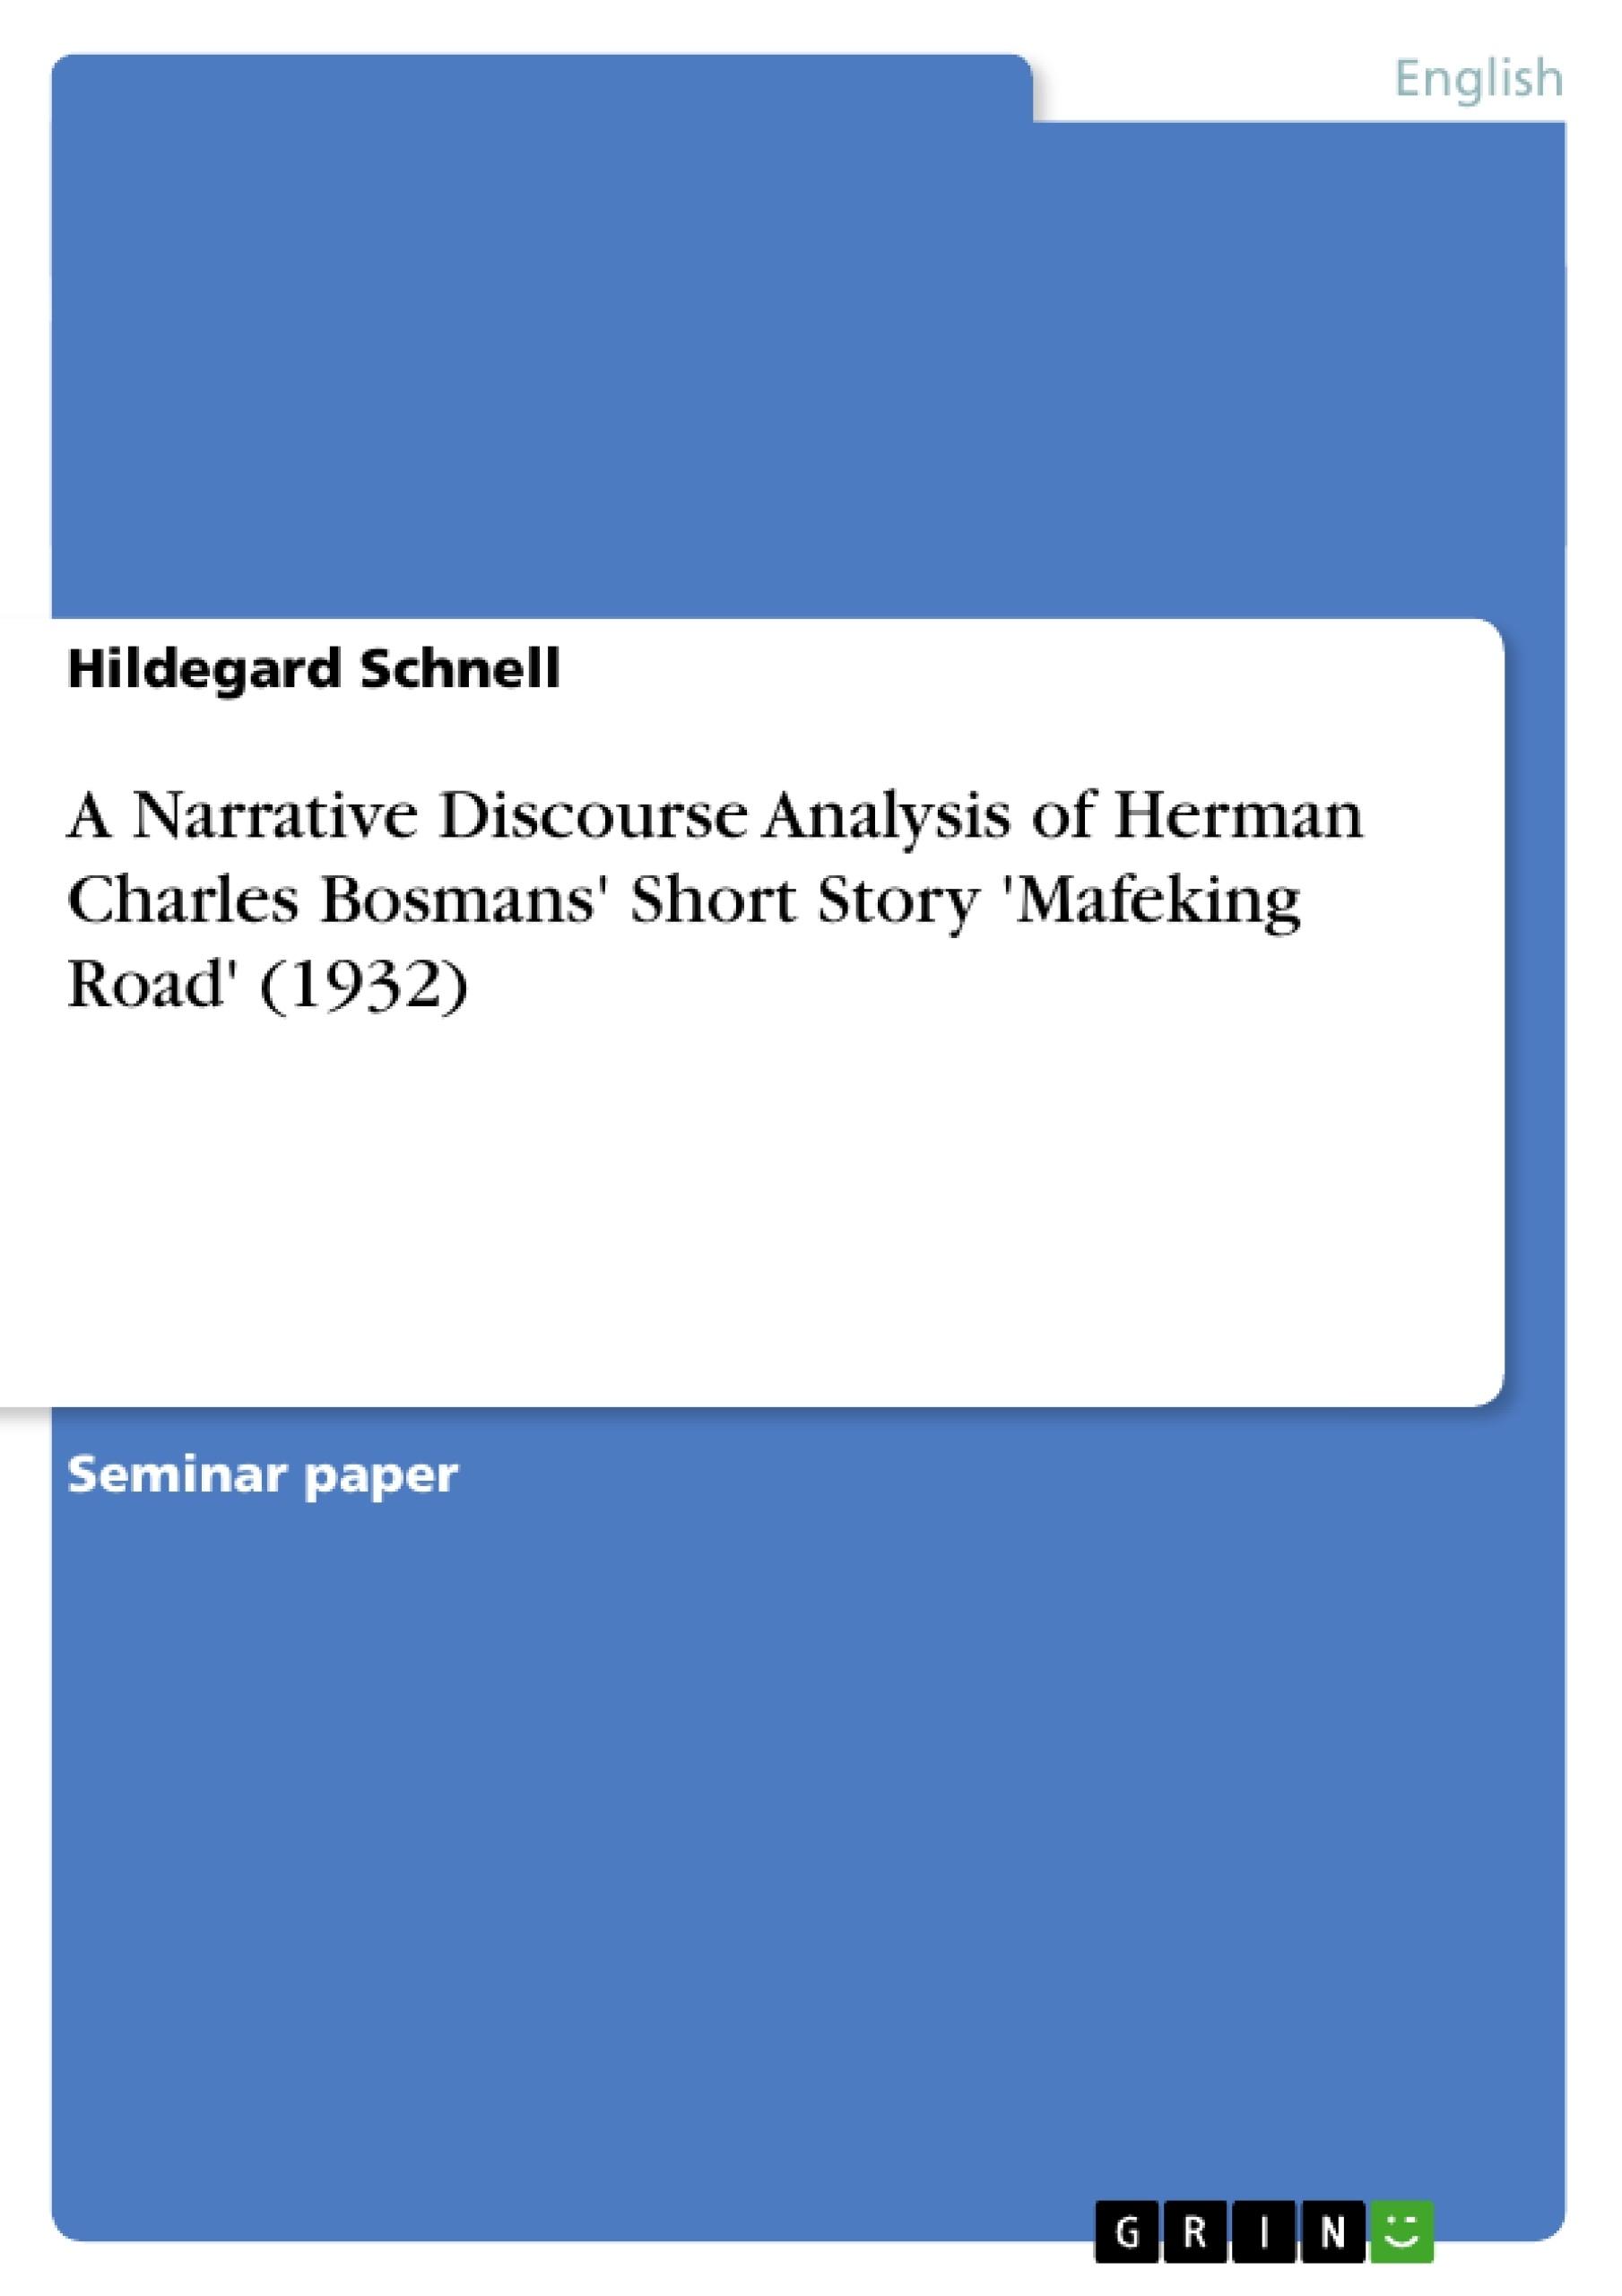 Title: A Narrative Discourse Analysis of Herman Charles Bosmans' Short Story 'Mafeking Road' (1932)